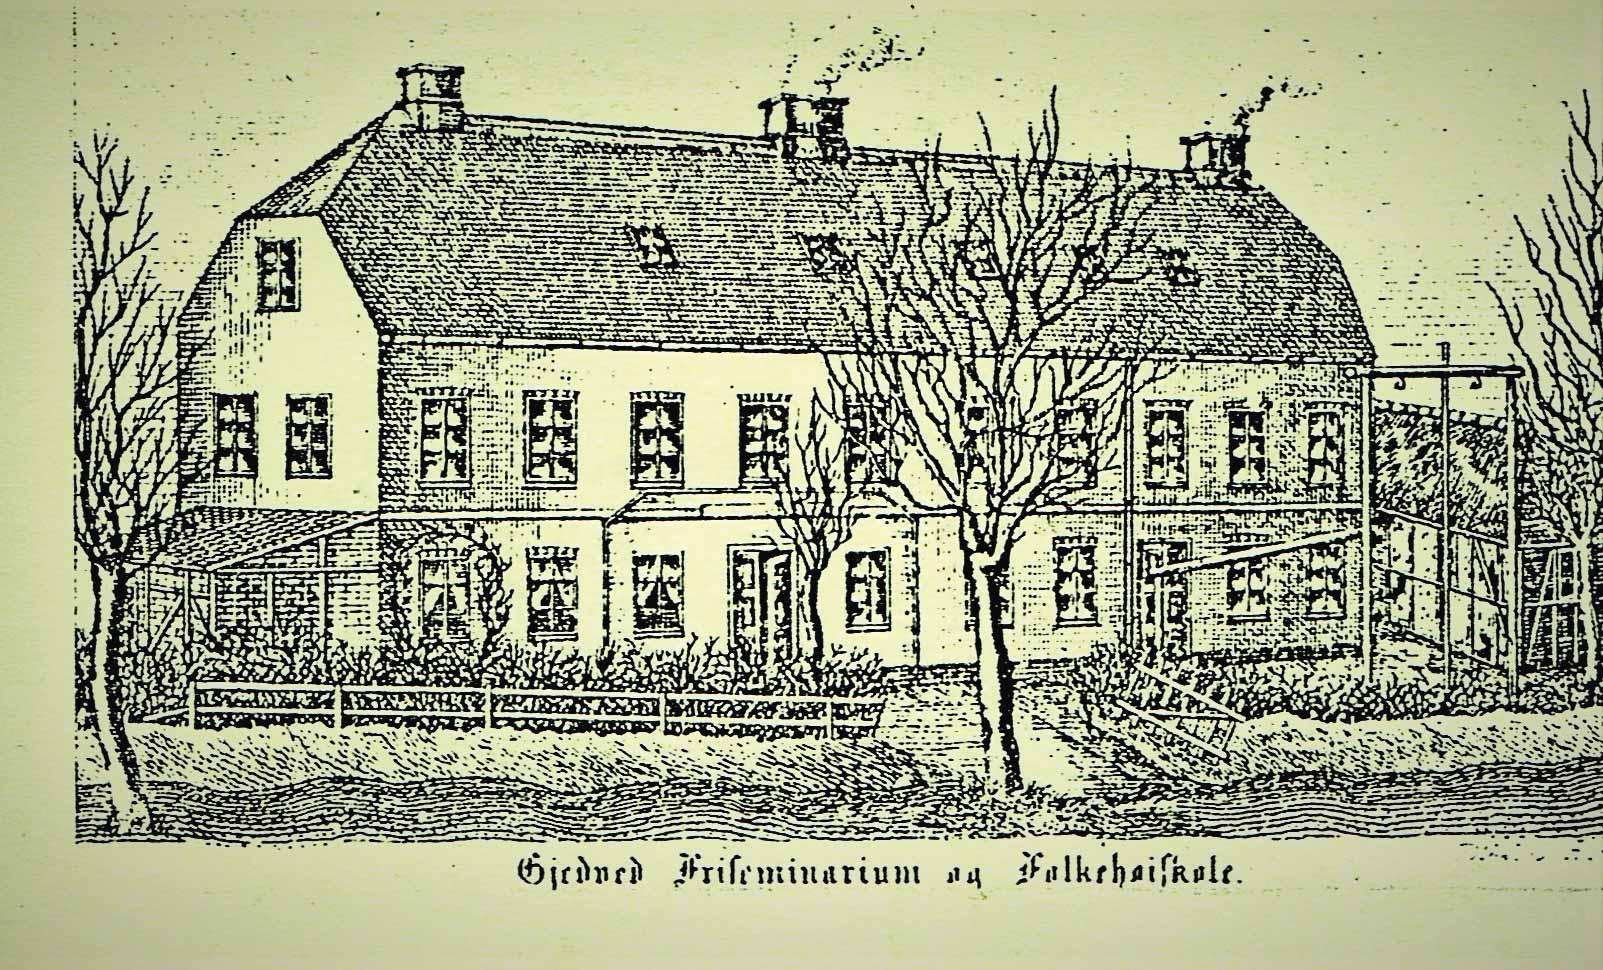 gedved-friseminarium-folkehoejskole